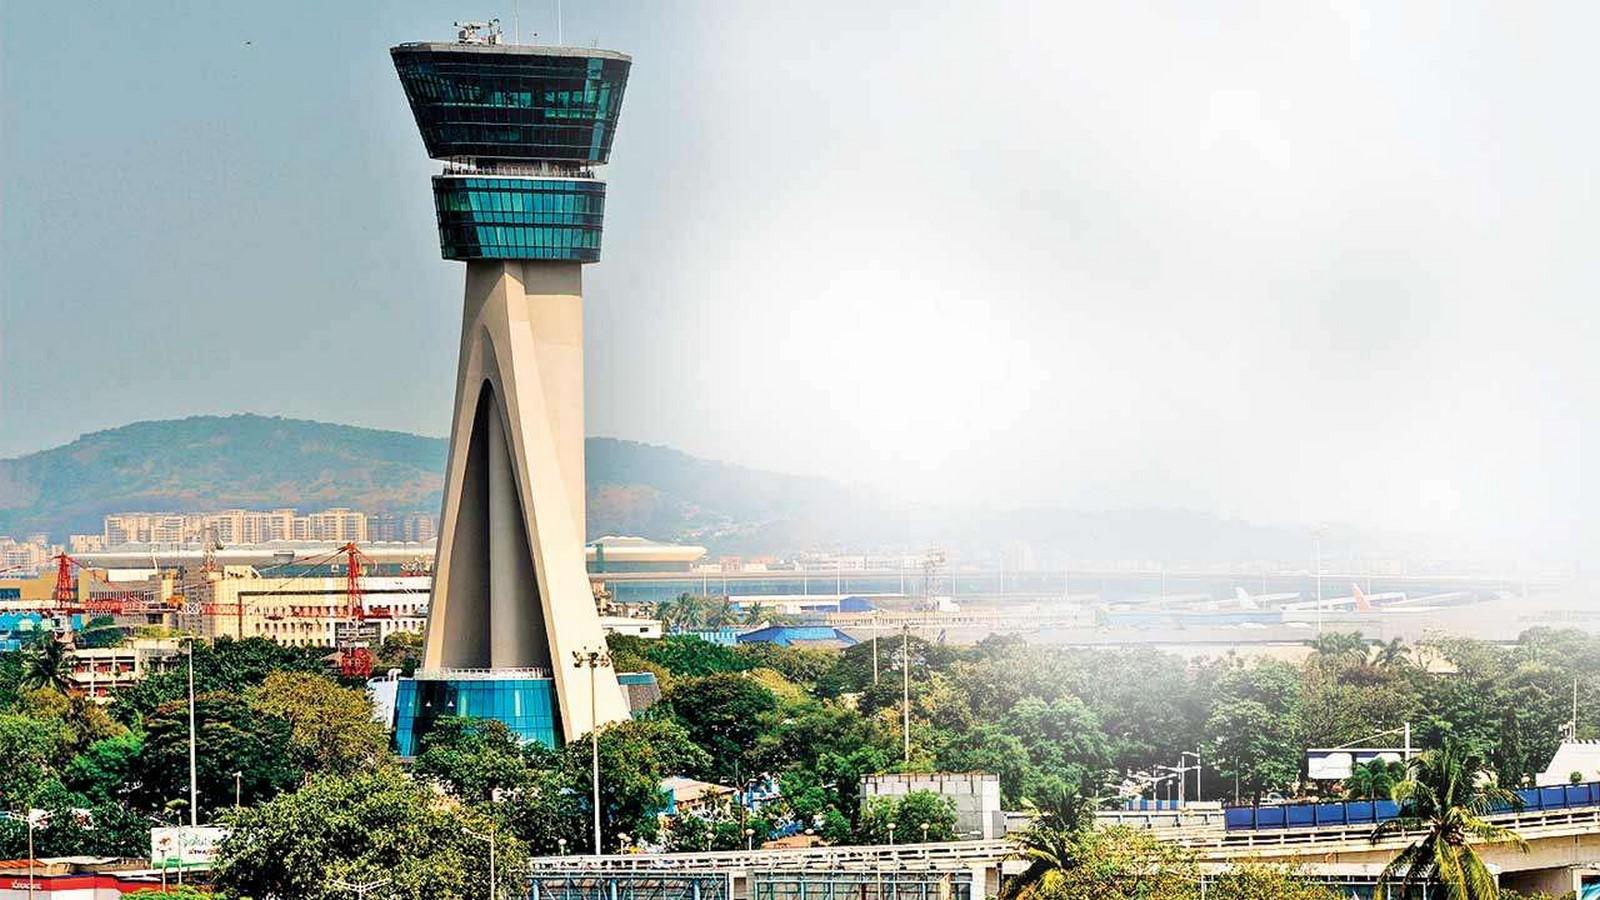 C S I AIRPORT ATC TOWER - Sheet2